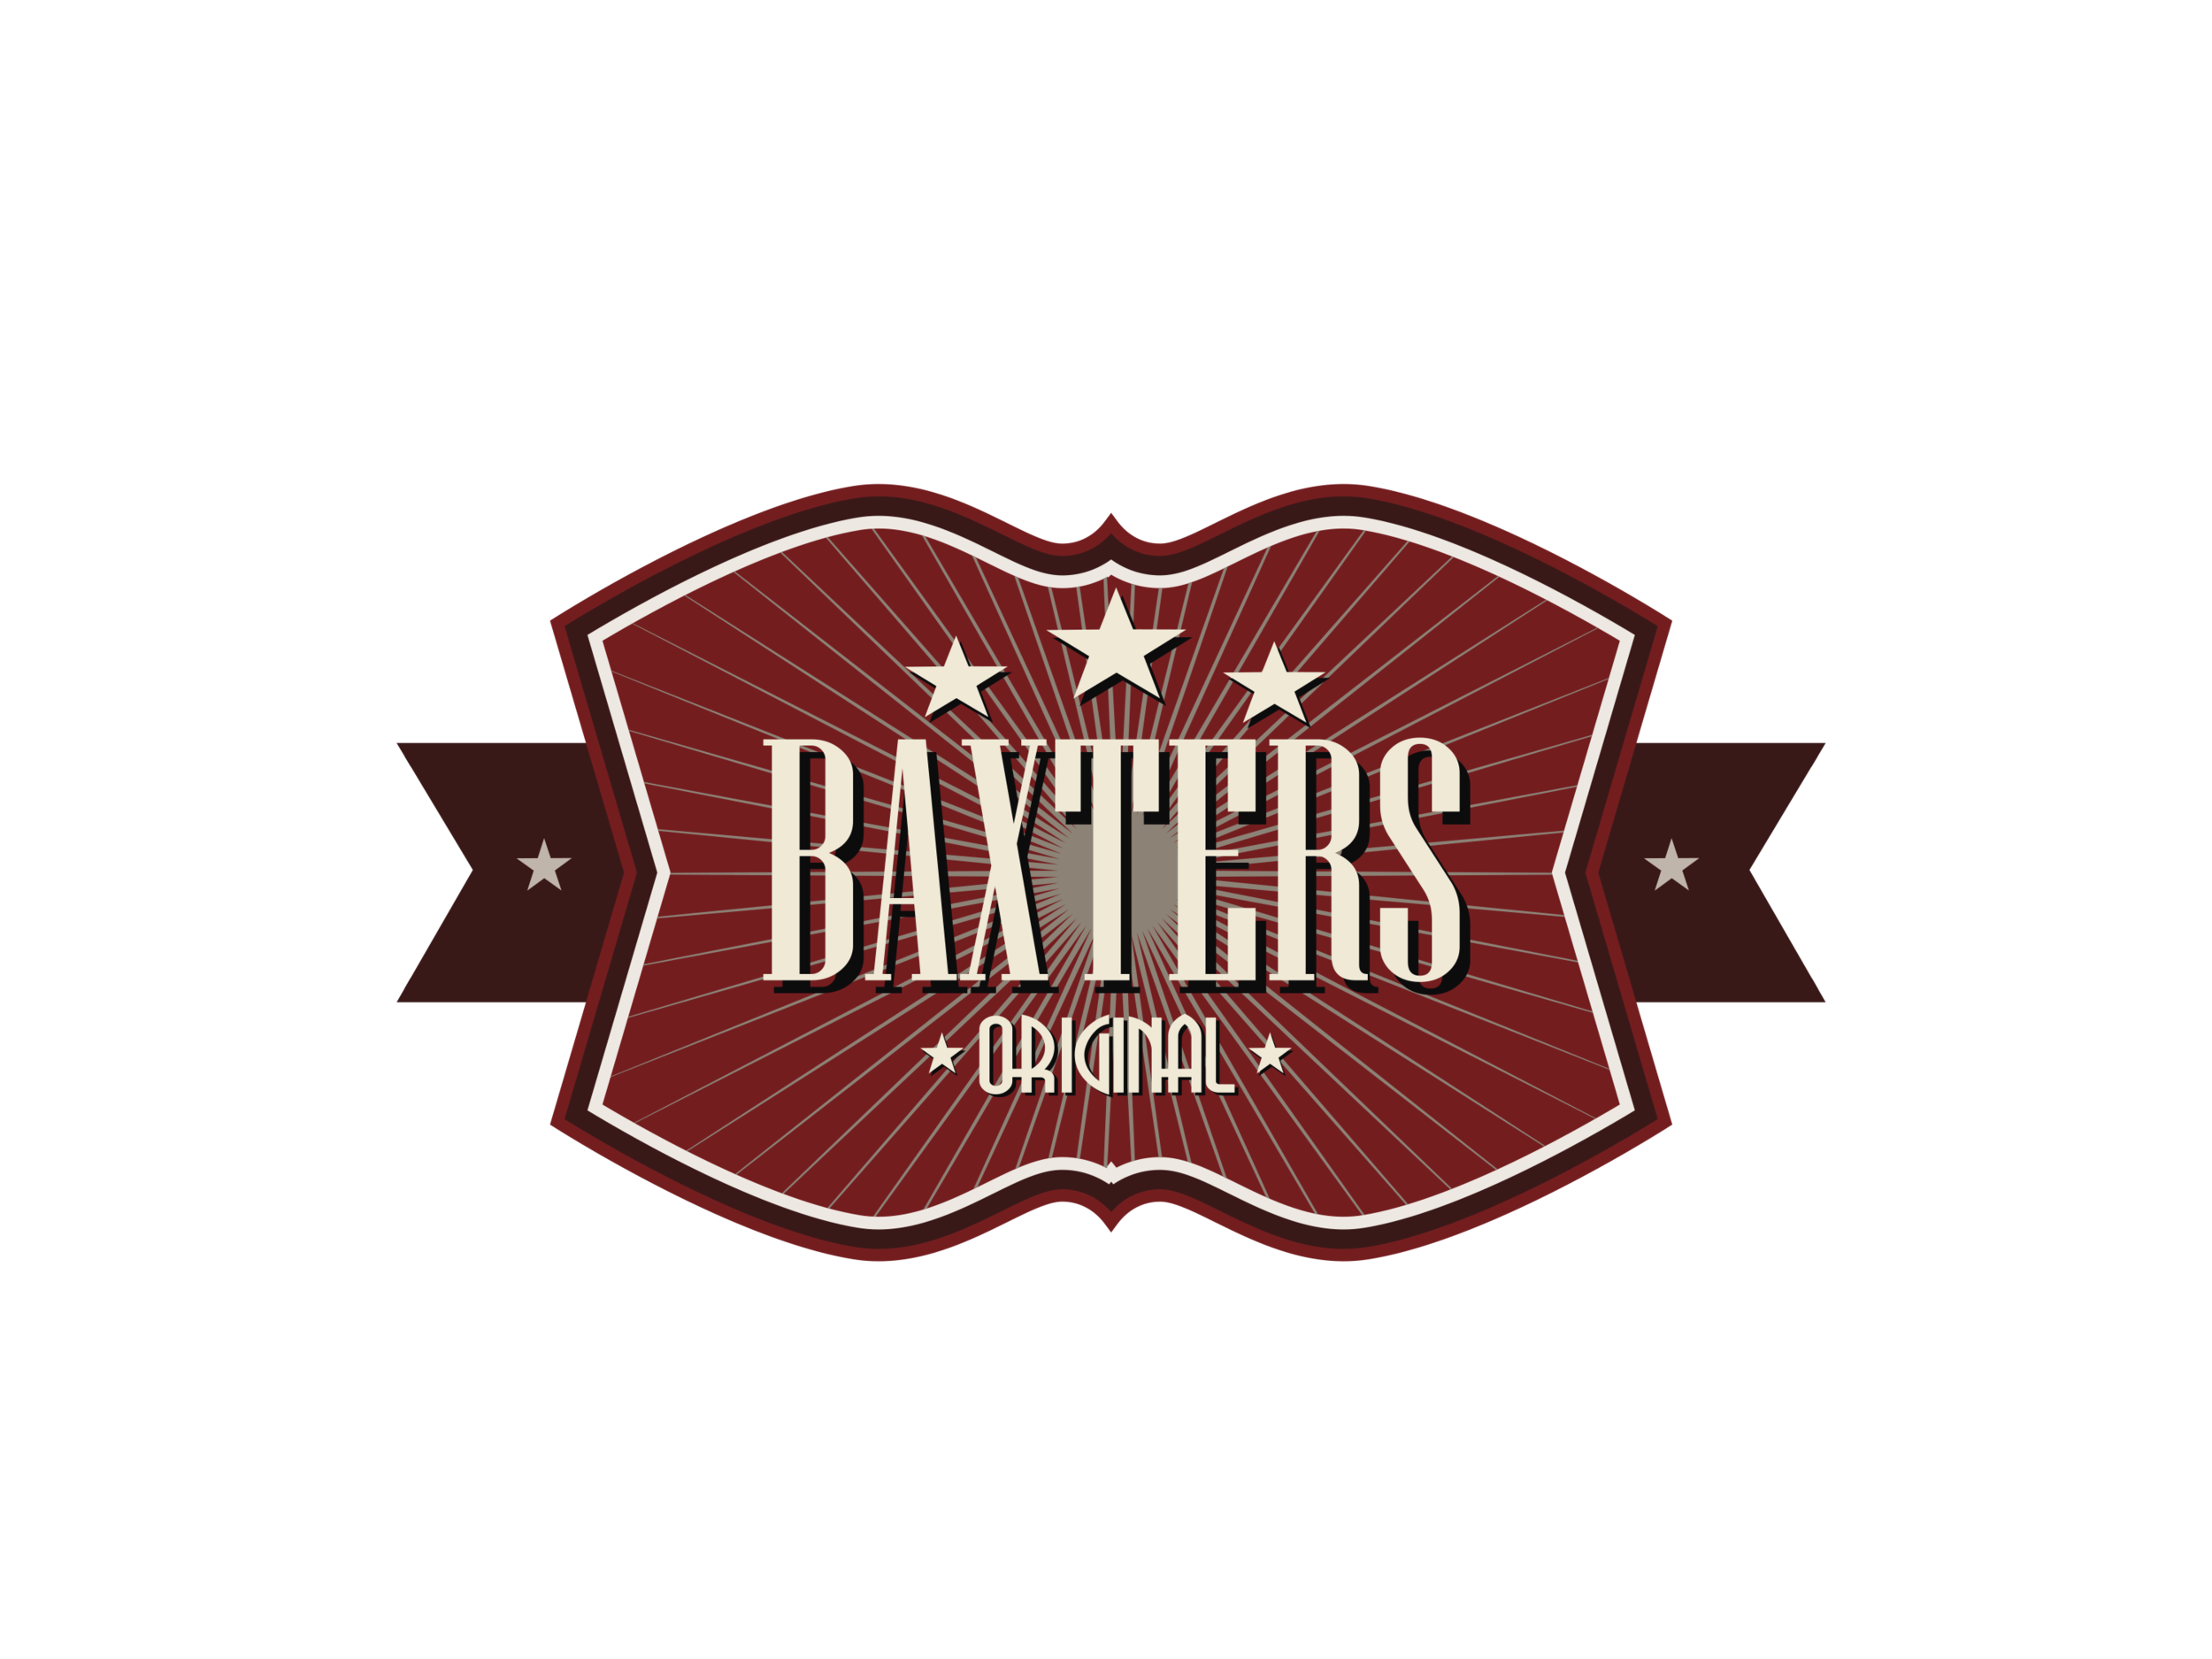 baxters original.png